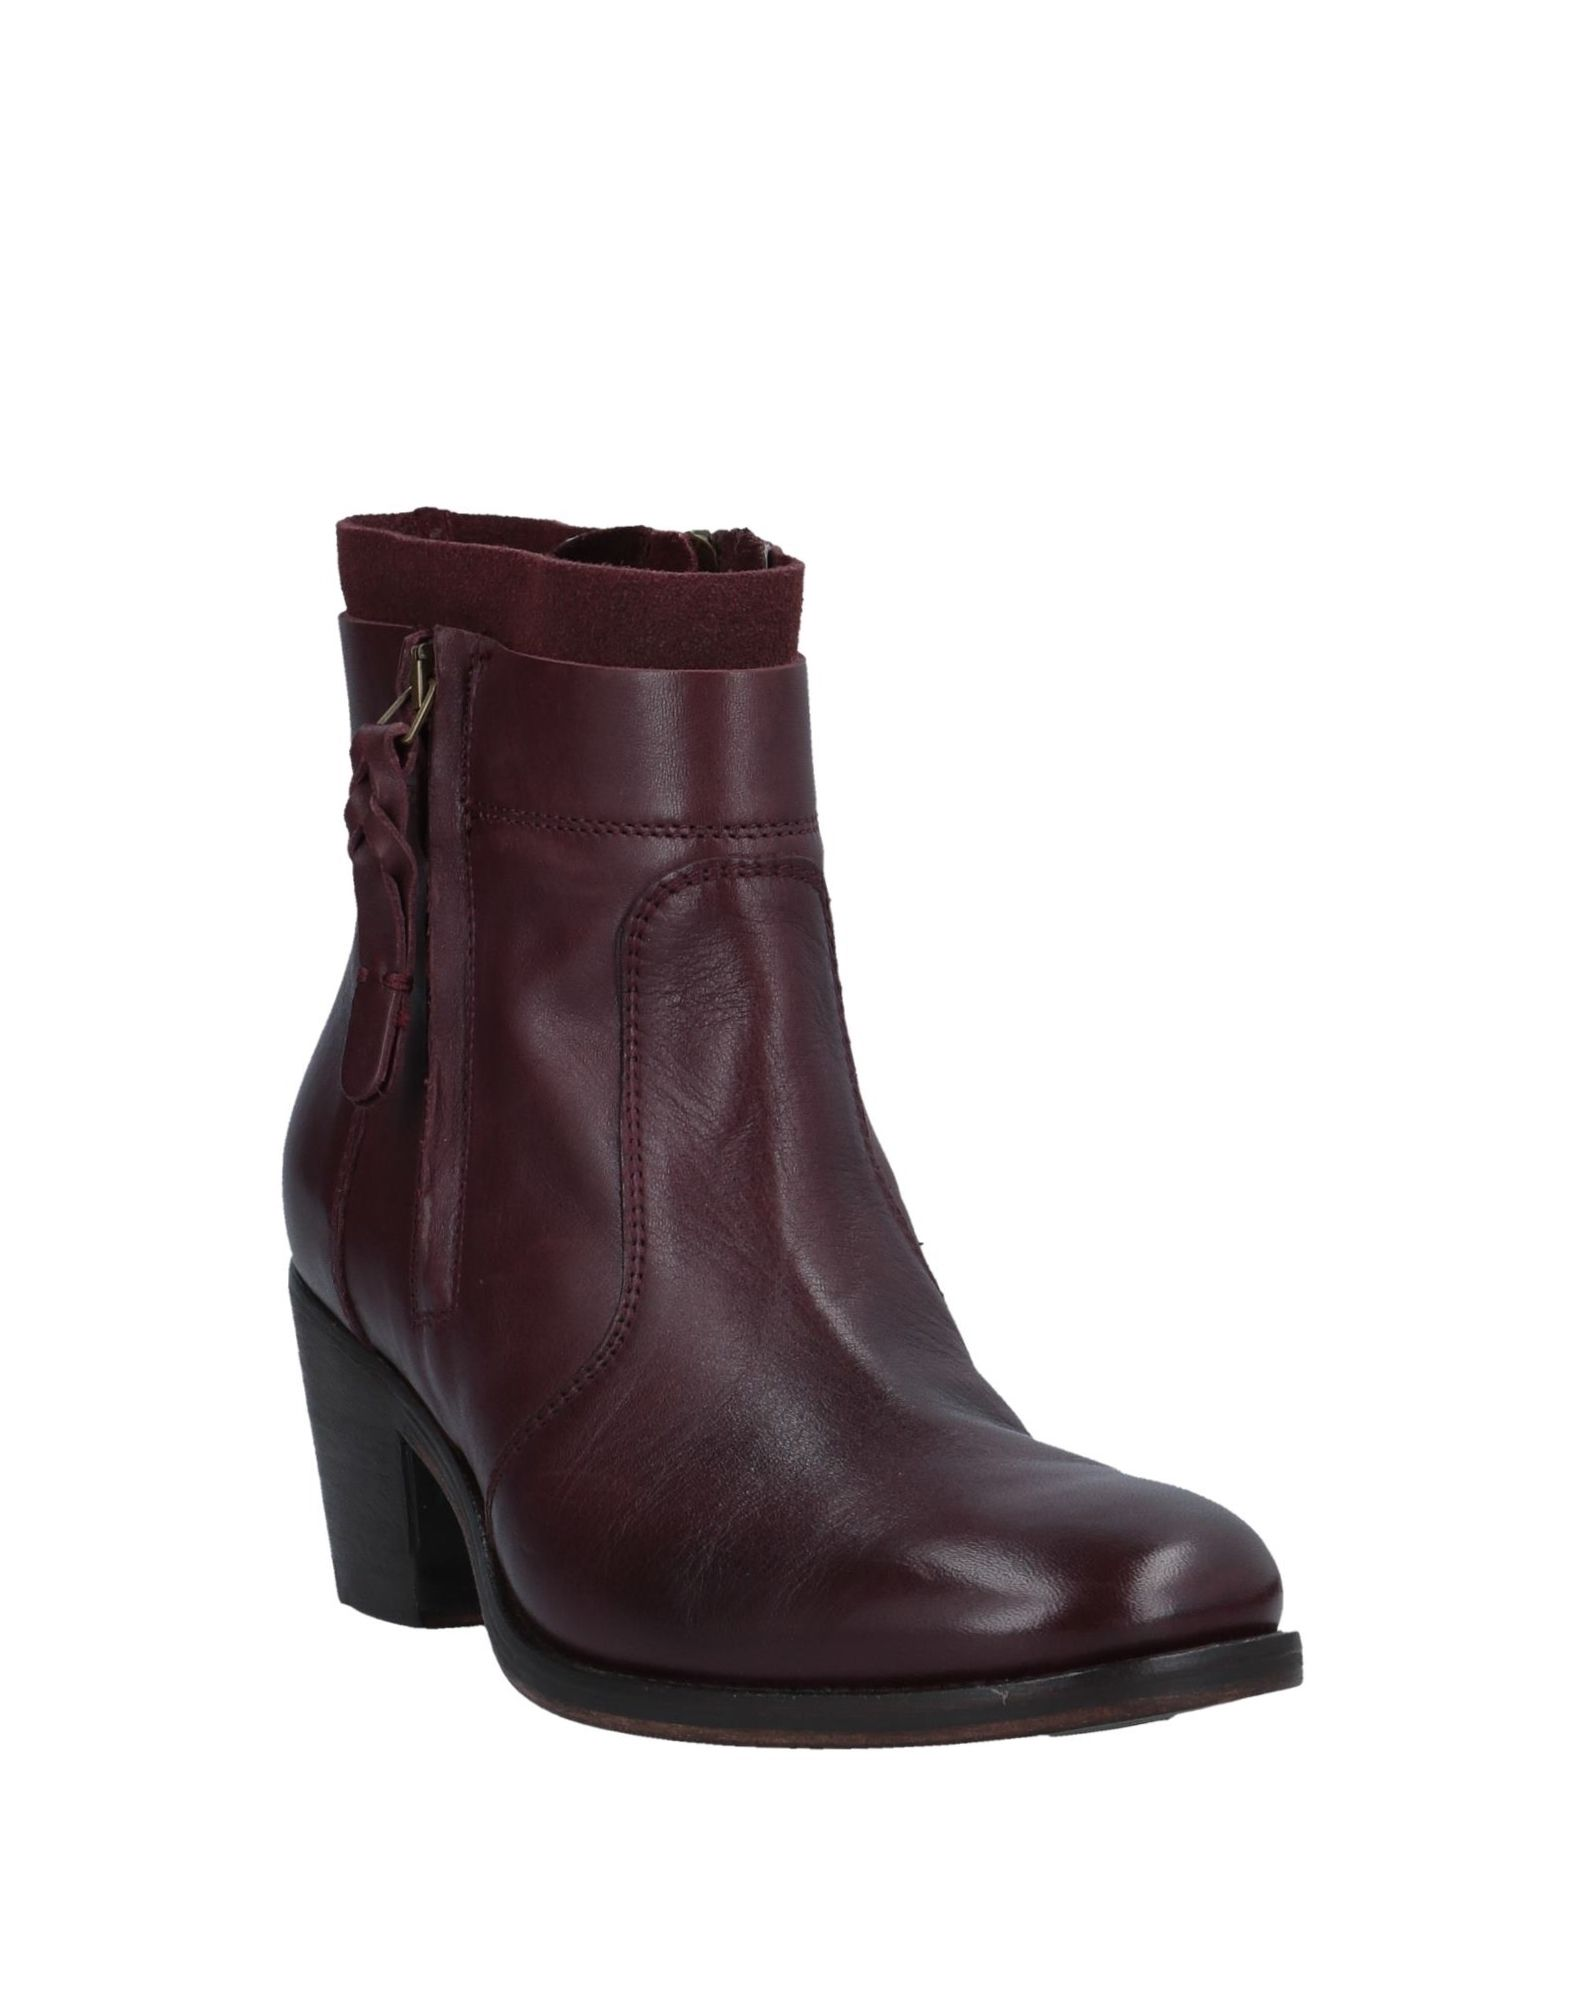 Stilvolle Fermani billige Schuhe Alberto Fermani Stilvolle Stiefelette Damen  44841186TS 5011c7